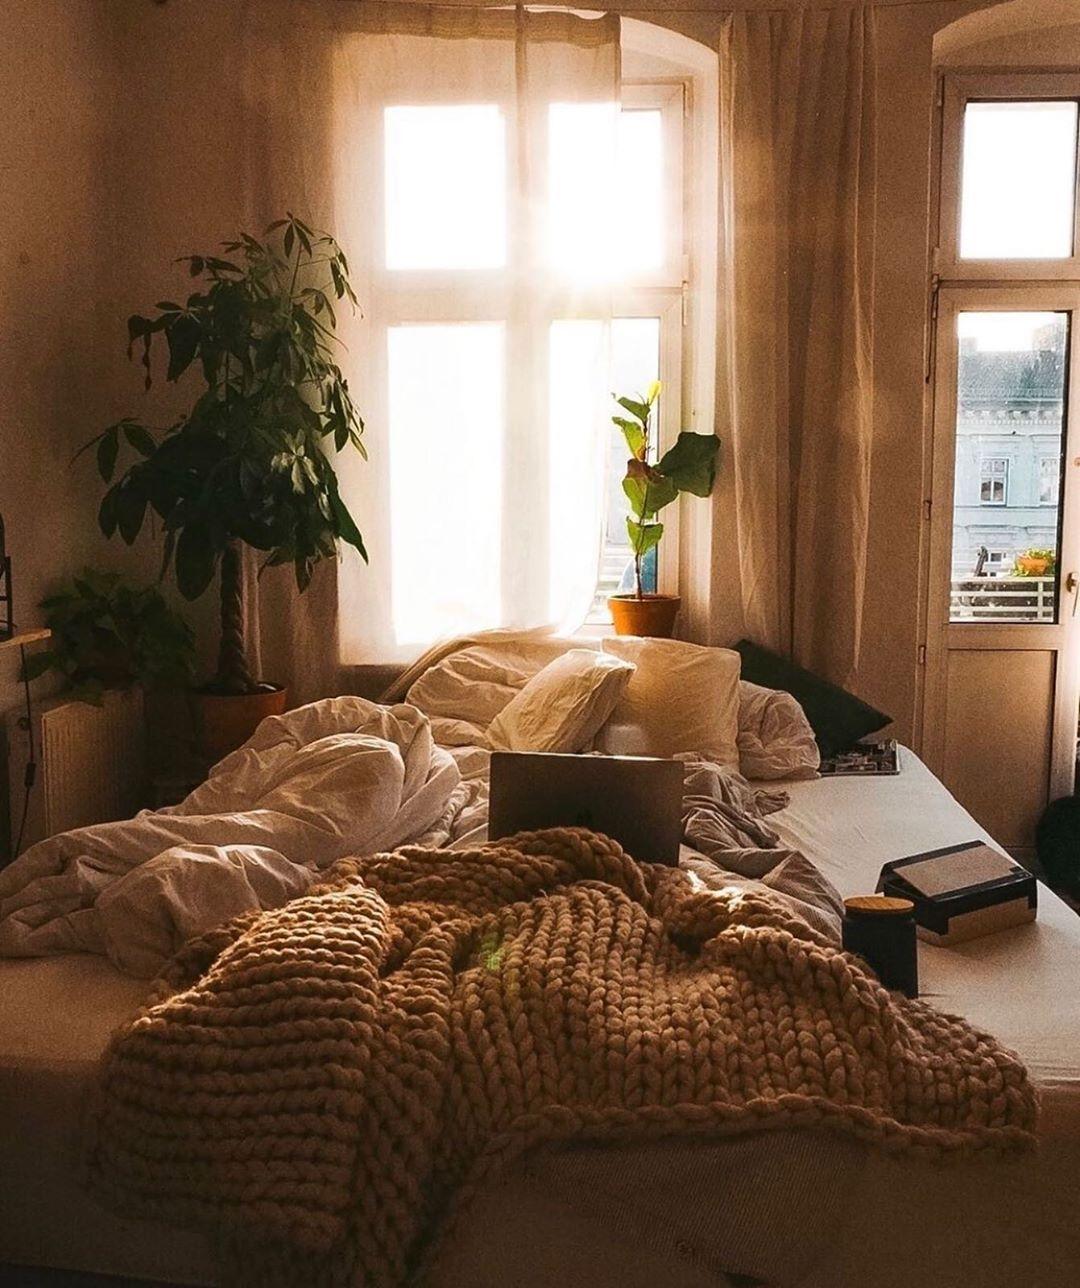 Readmore.....#interiordecorator #interiorhome #interiorandhome #interiordesigns #passion4interior #bedrooms #bedroomdecor #bedroomideas #bedroom #bedroomgoals #bedroomdesign